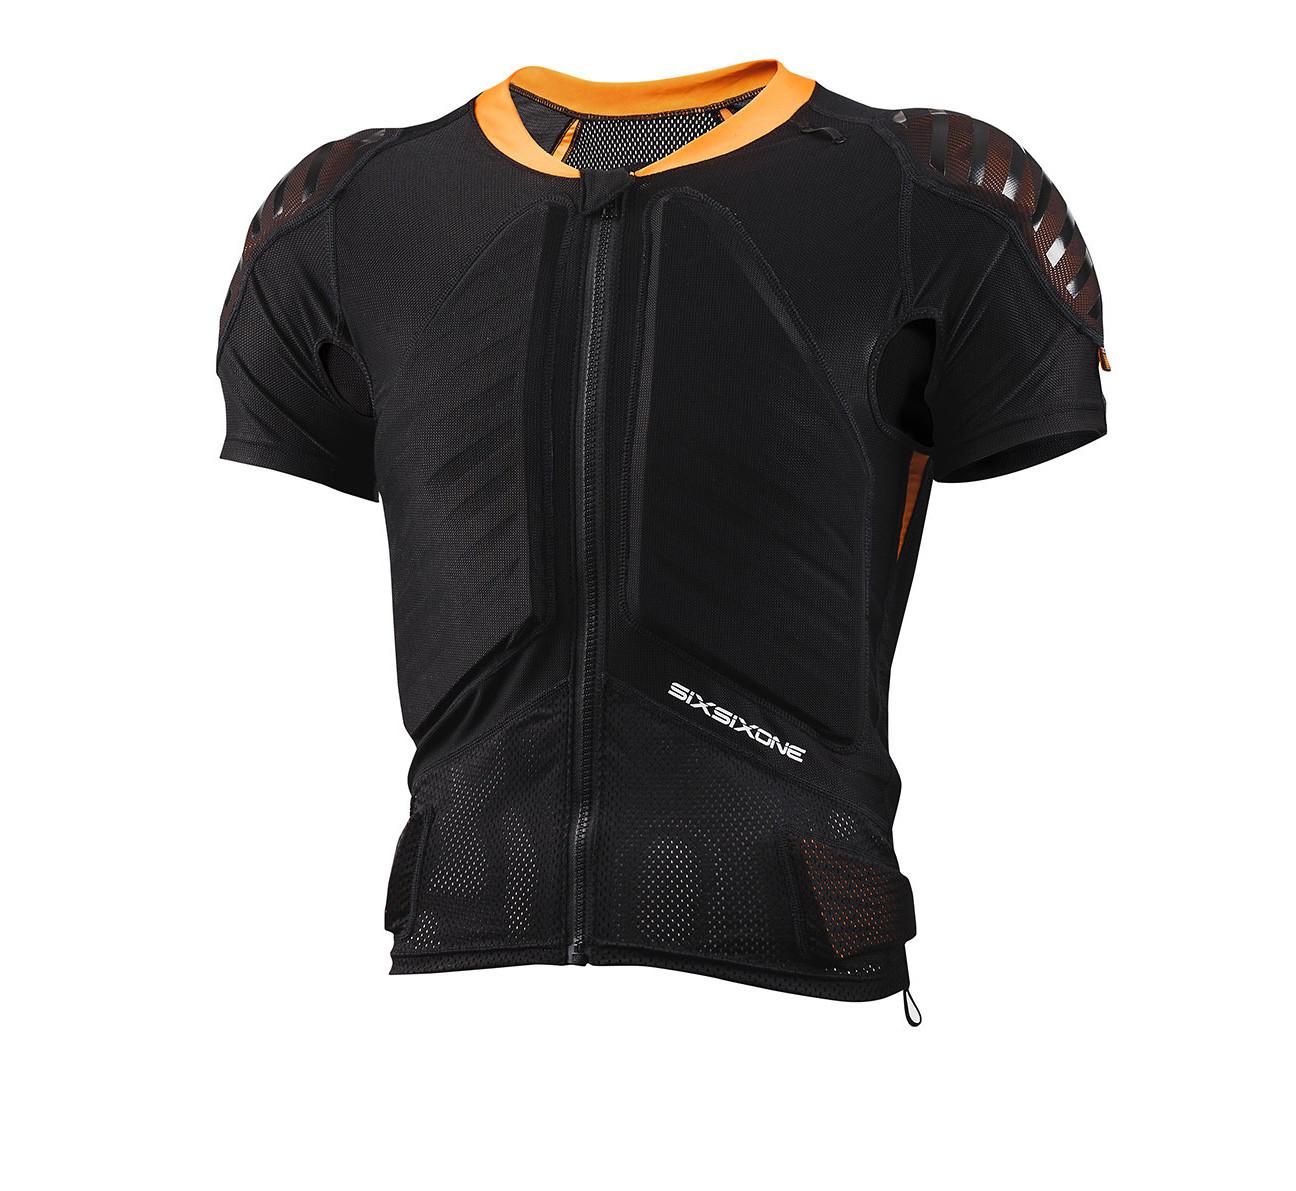 apparel(1300x1191)_0081_661-Evo-SS-Jacket-front-7050-05